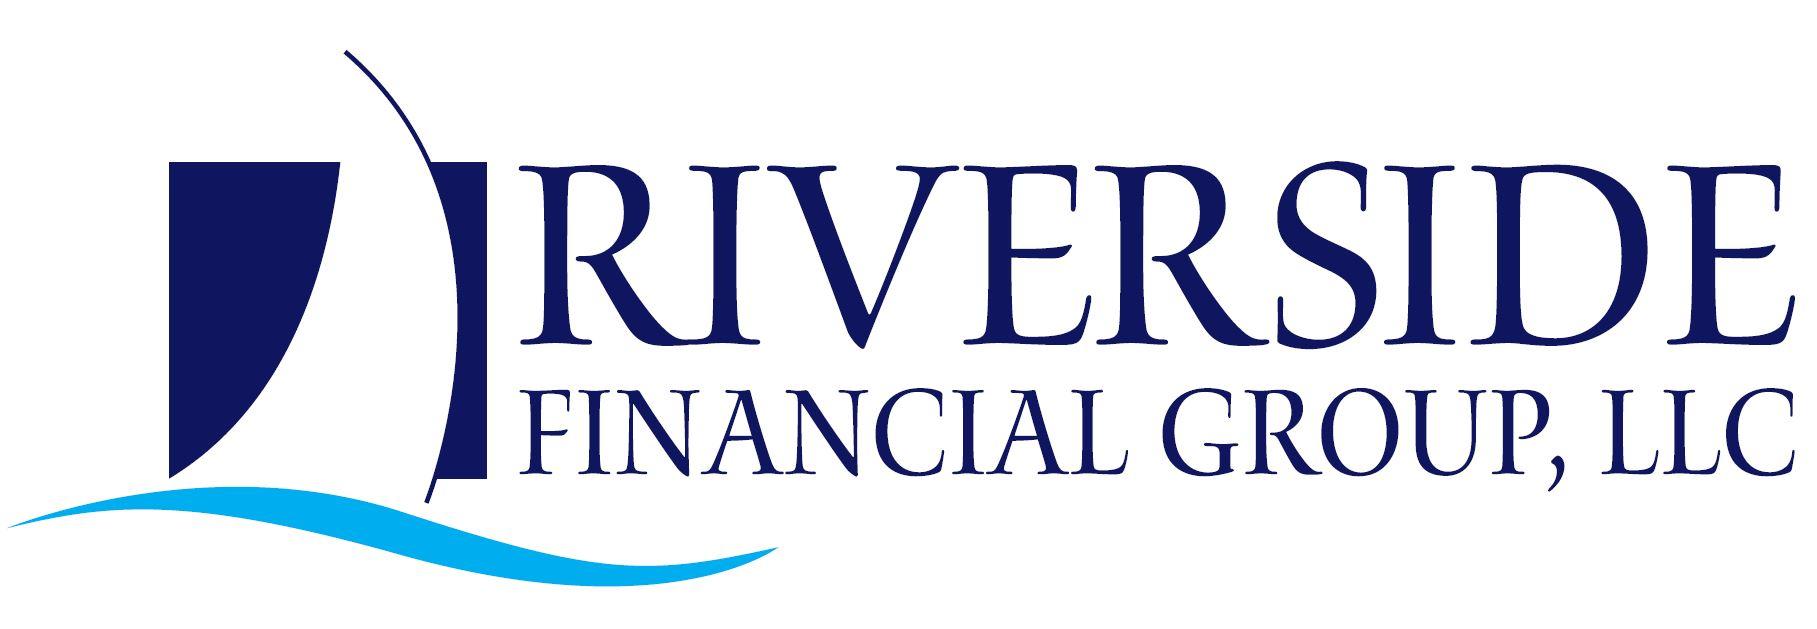 Riverside Financial Group, LLC